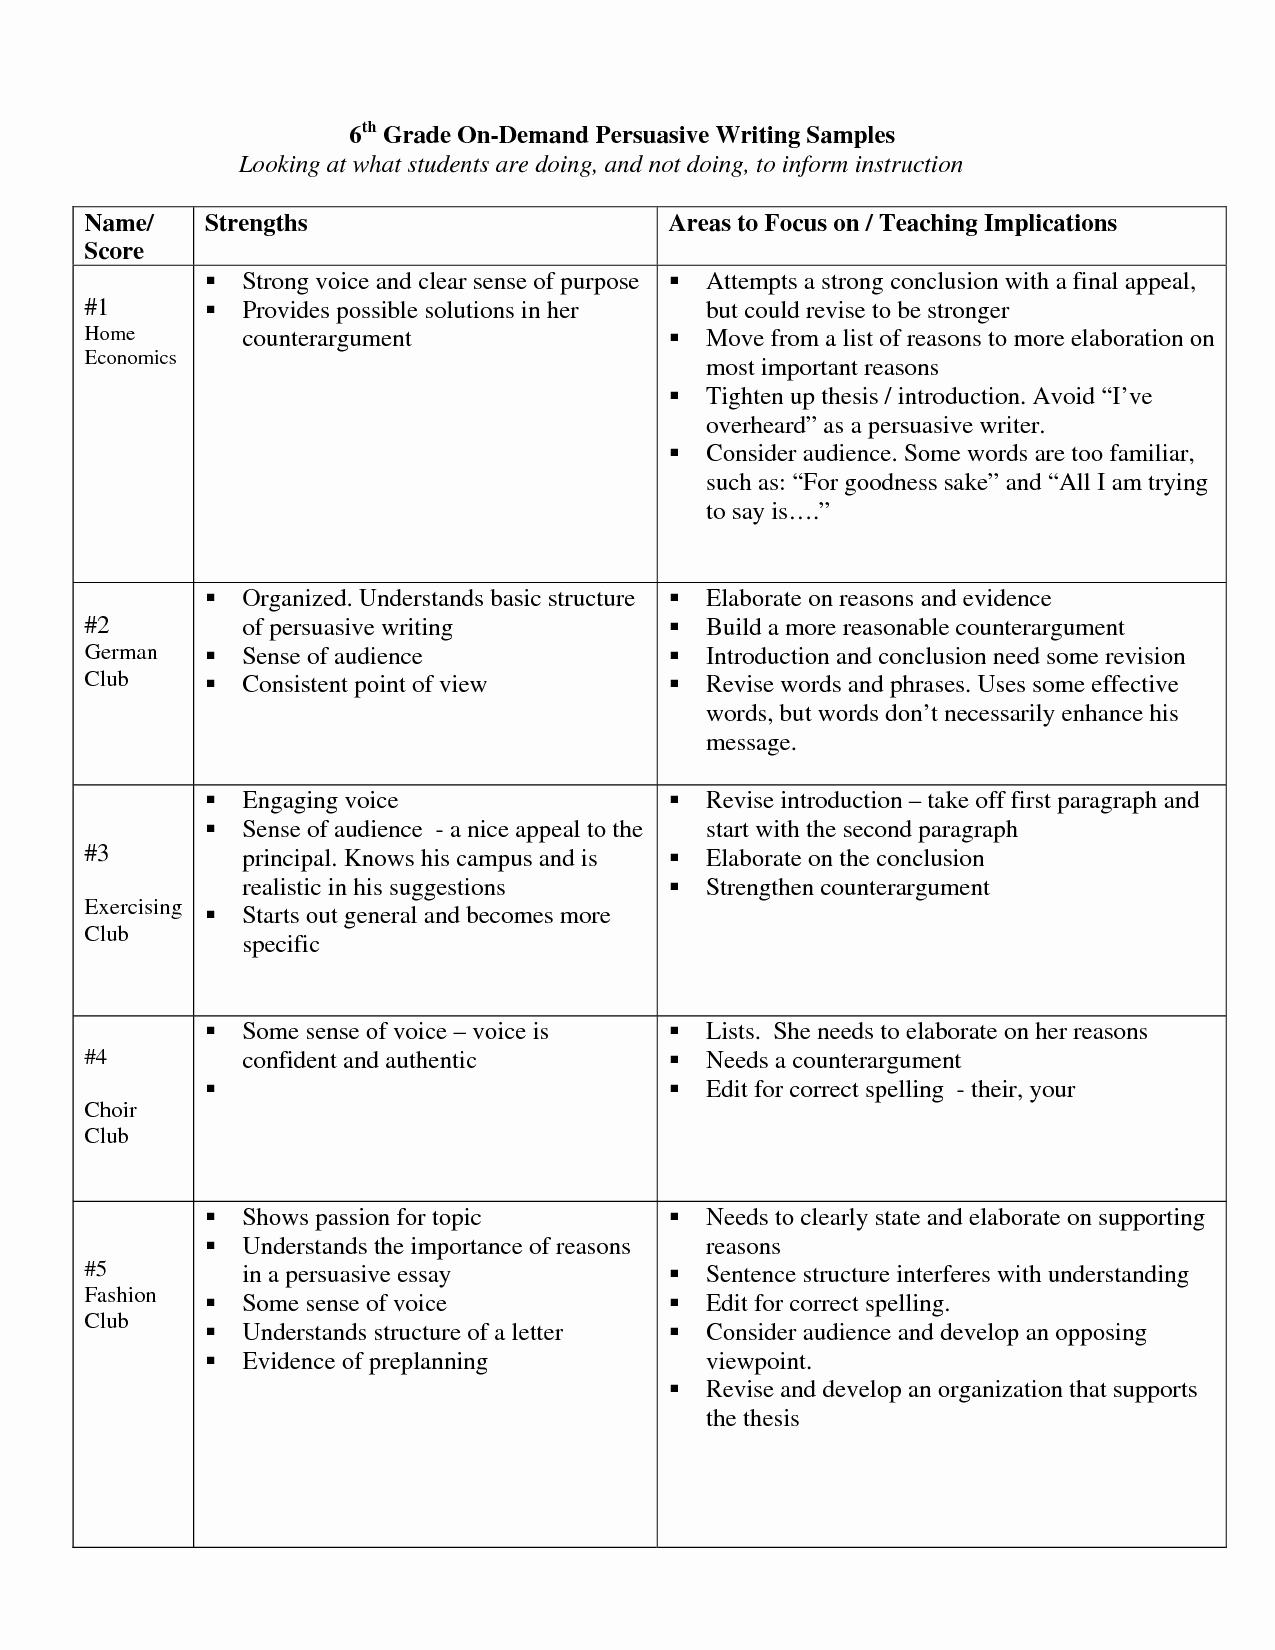 6th Grade Essay Writing Worksheets New Essays for 6th Grade topics 6th Grade Writing Prompts